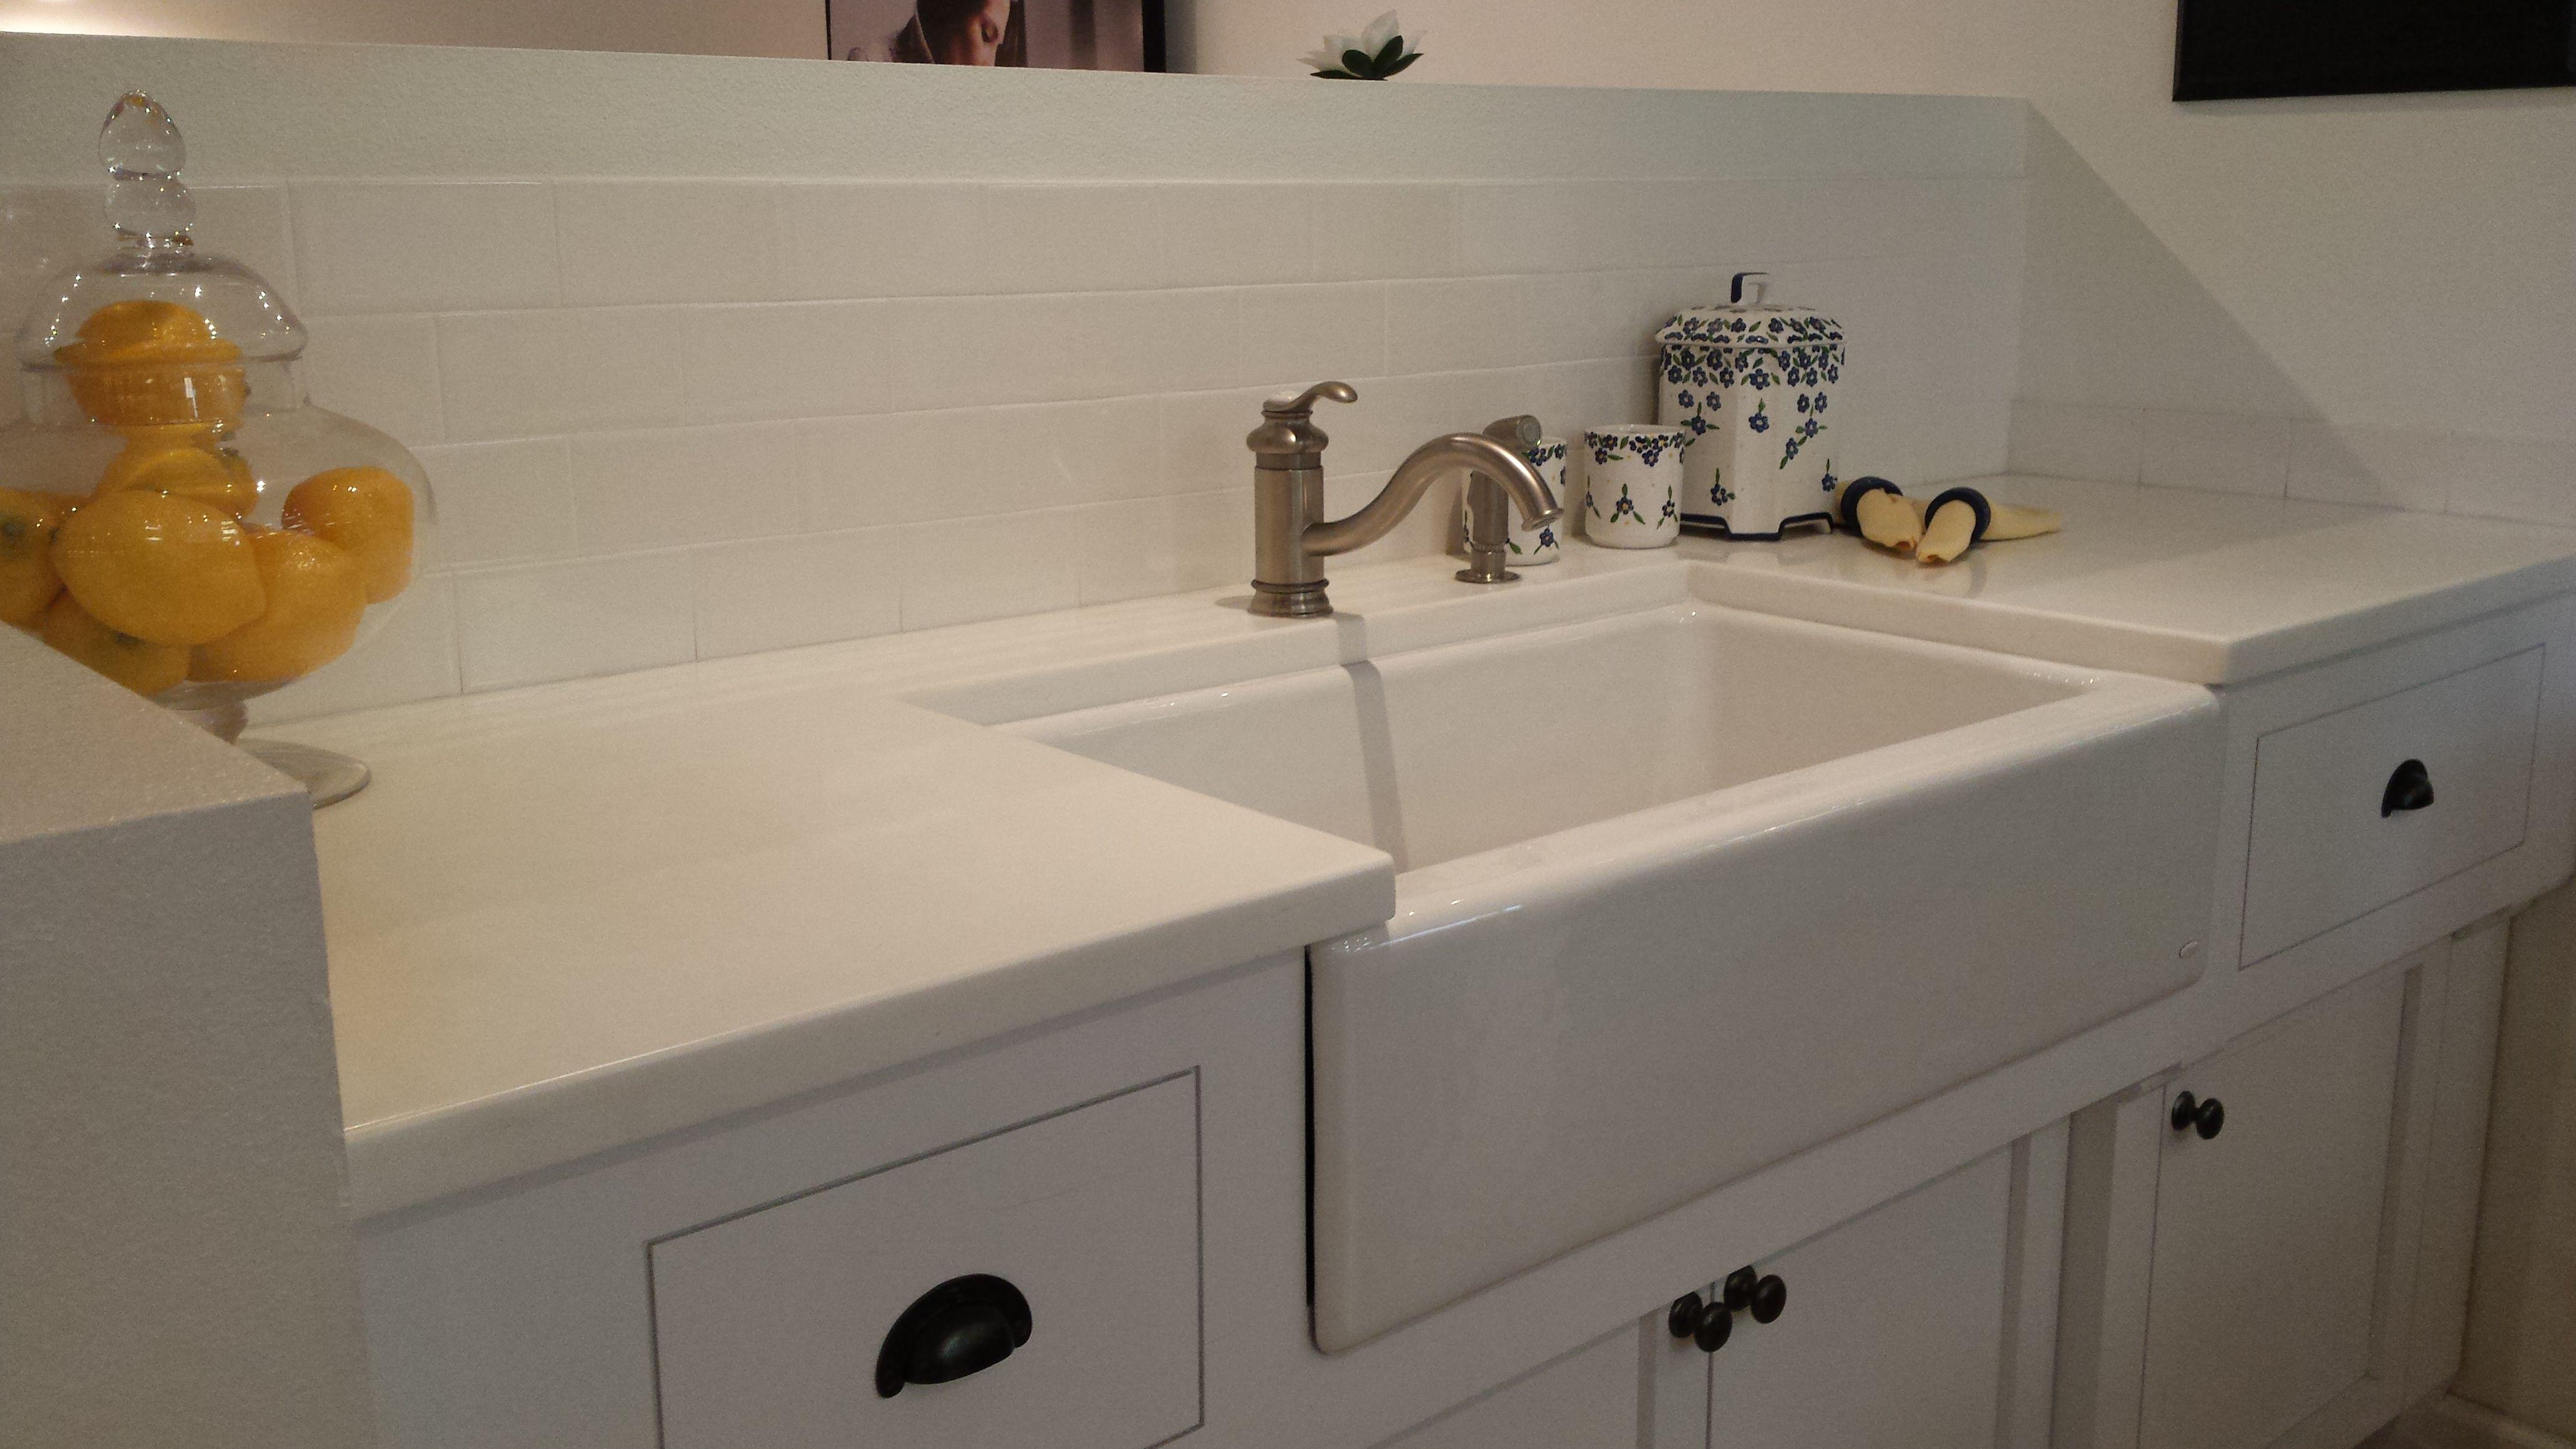 Kohler Dickinson Apron Front Sink Fairfax Faucet Sink